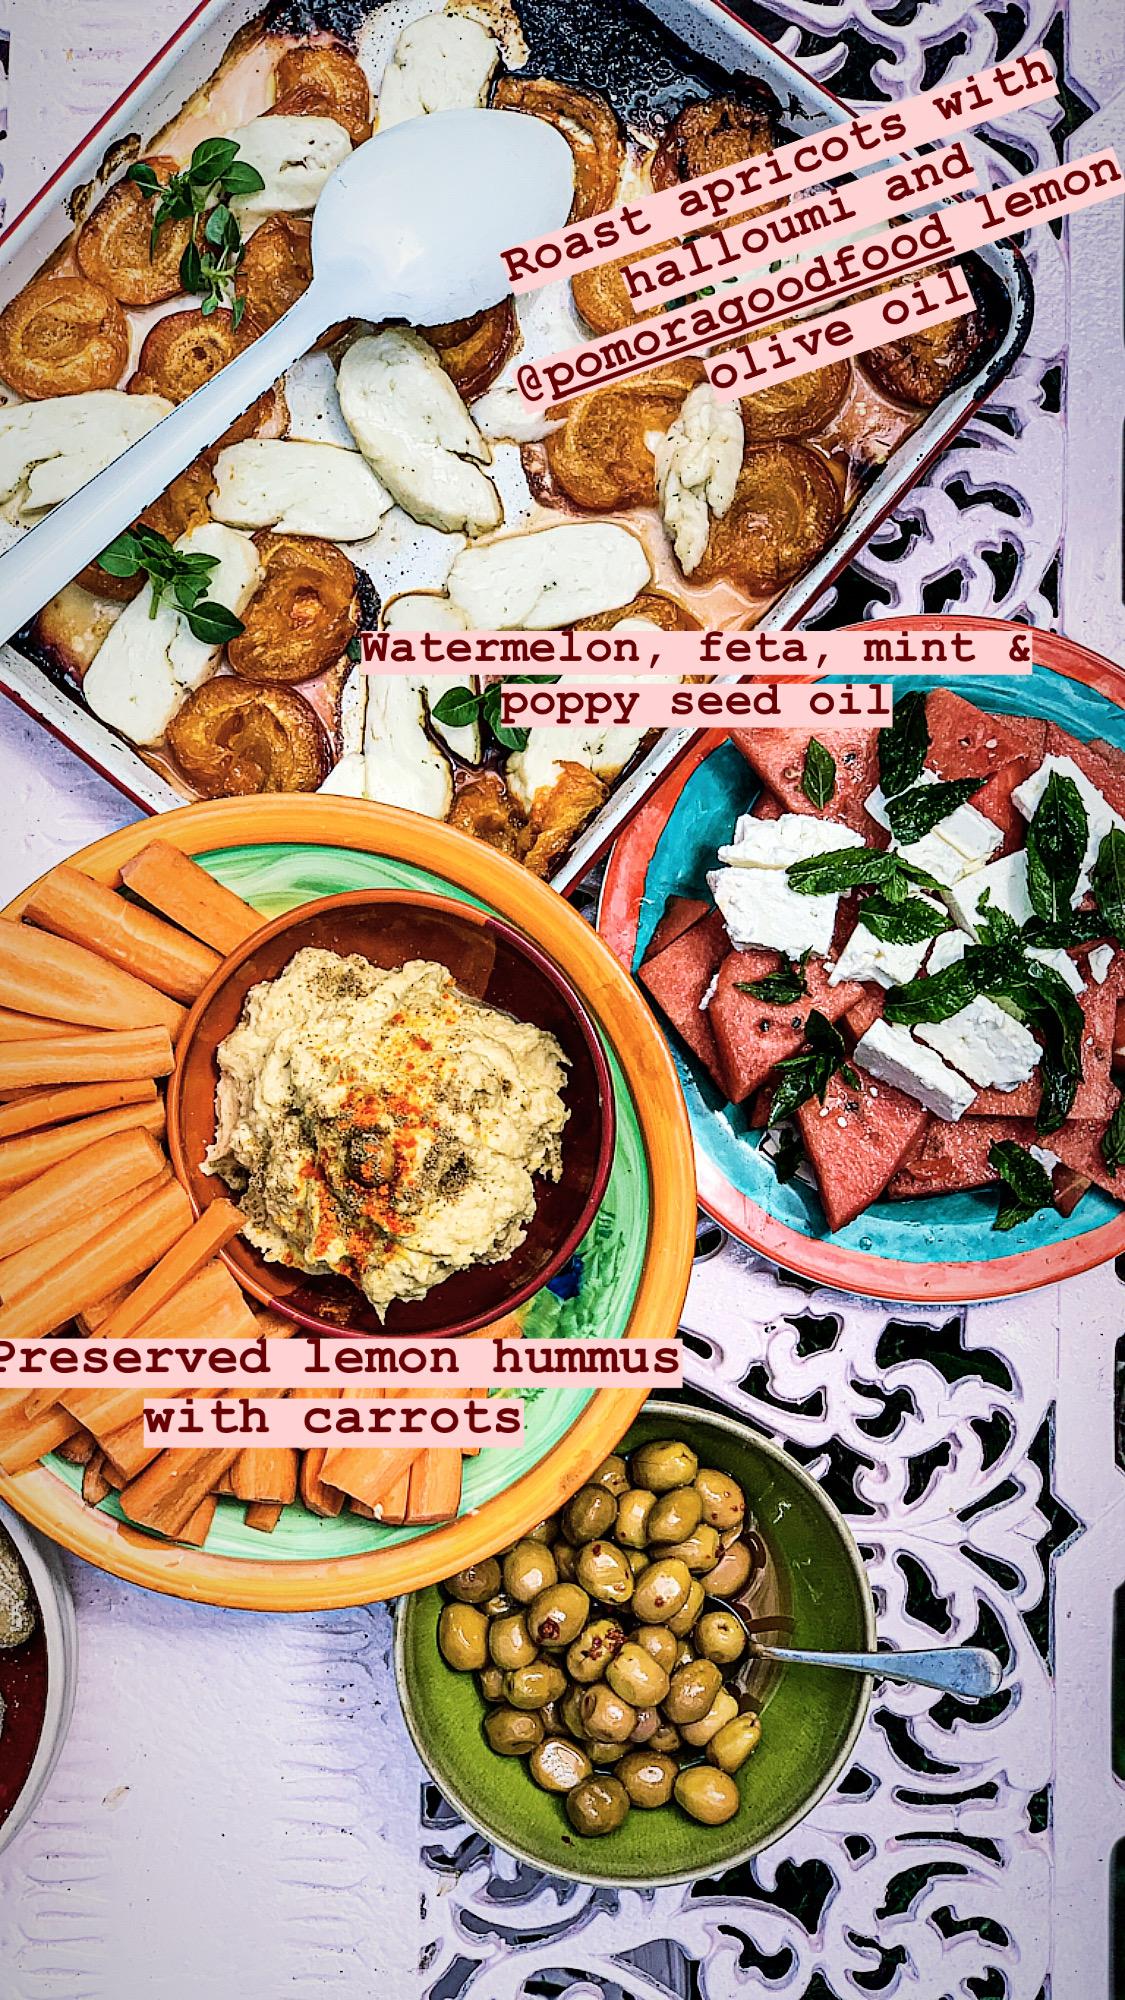 preserved lemon hummus and watermelon salad pic: Kerstin rodgers/msmarmitelover.com